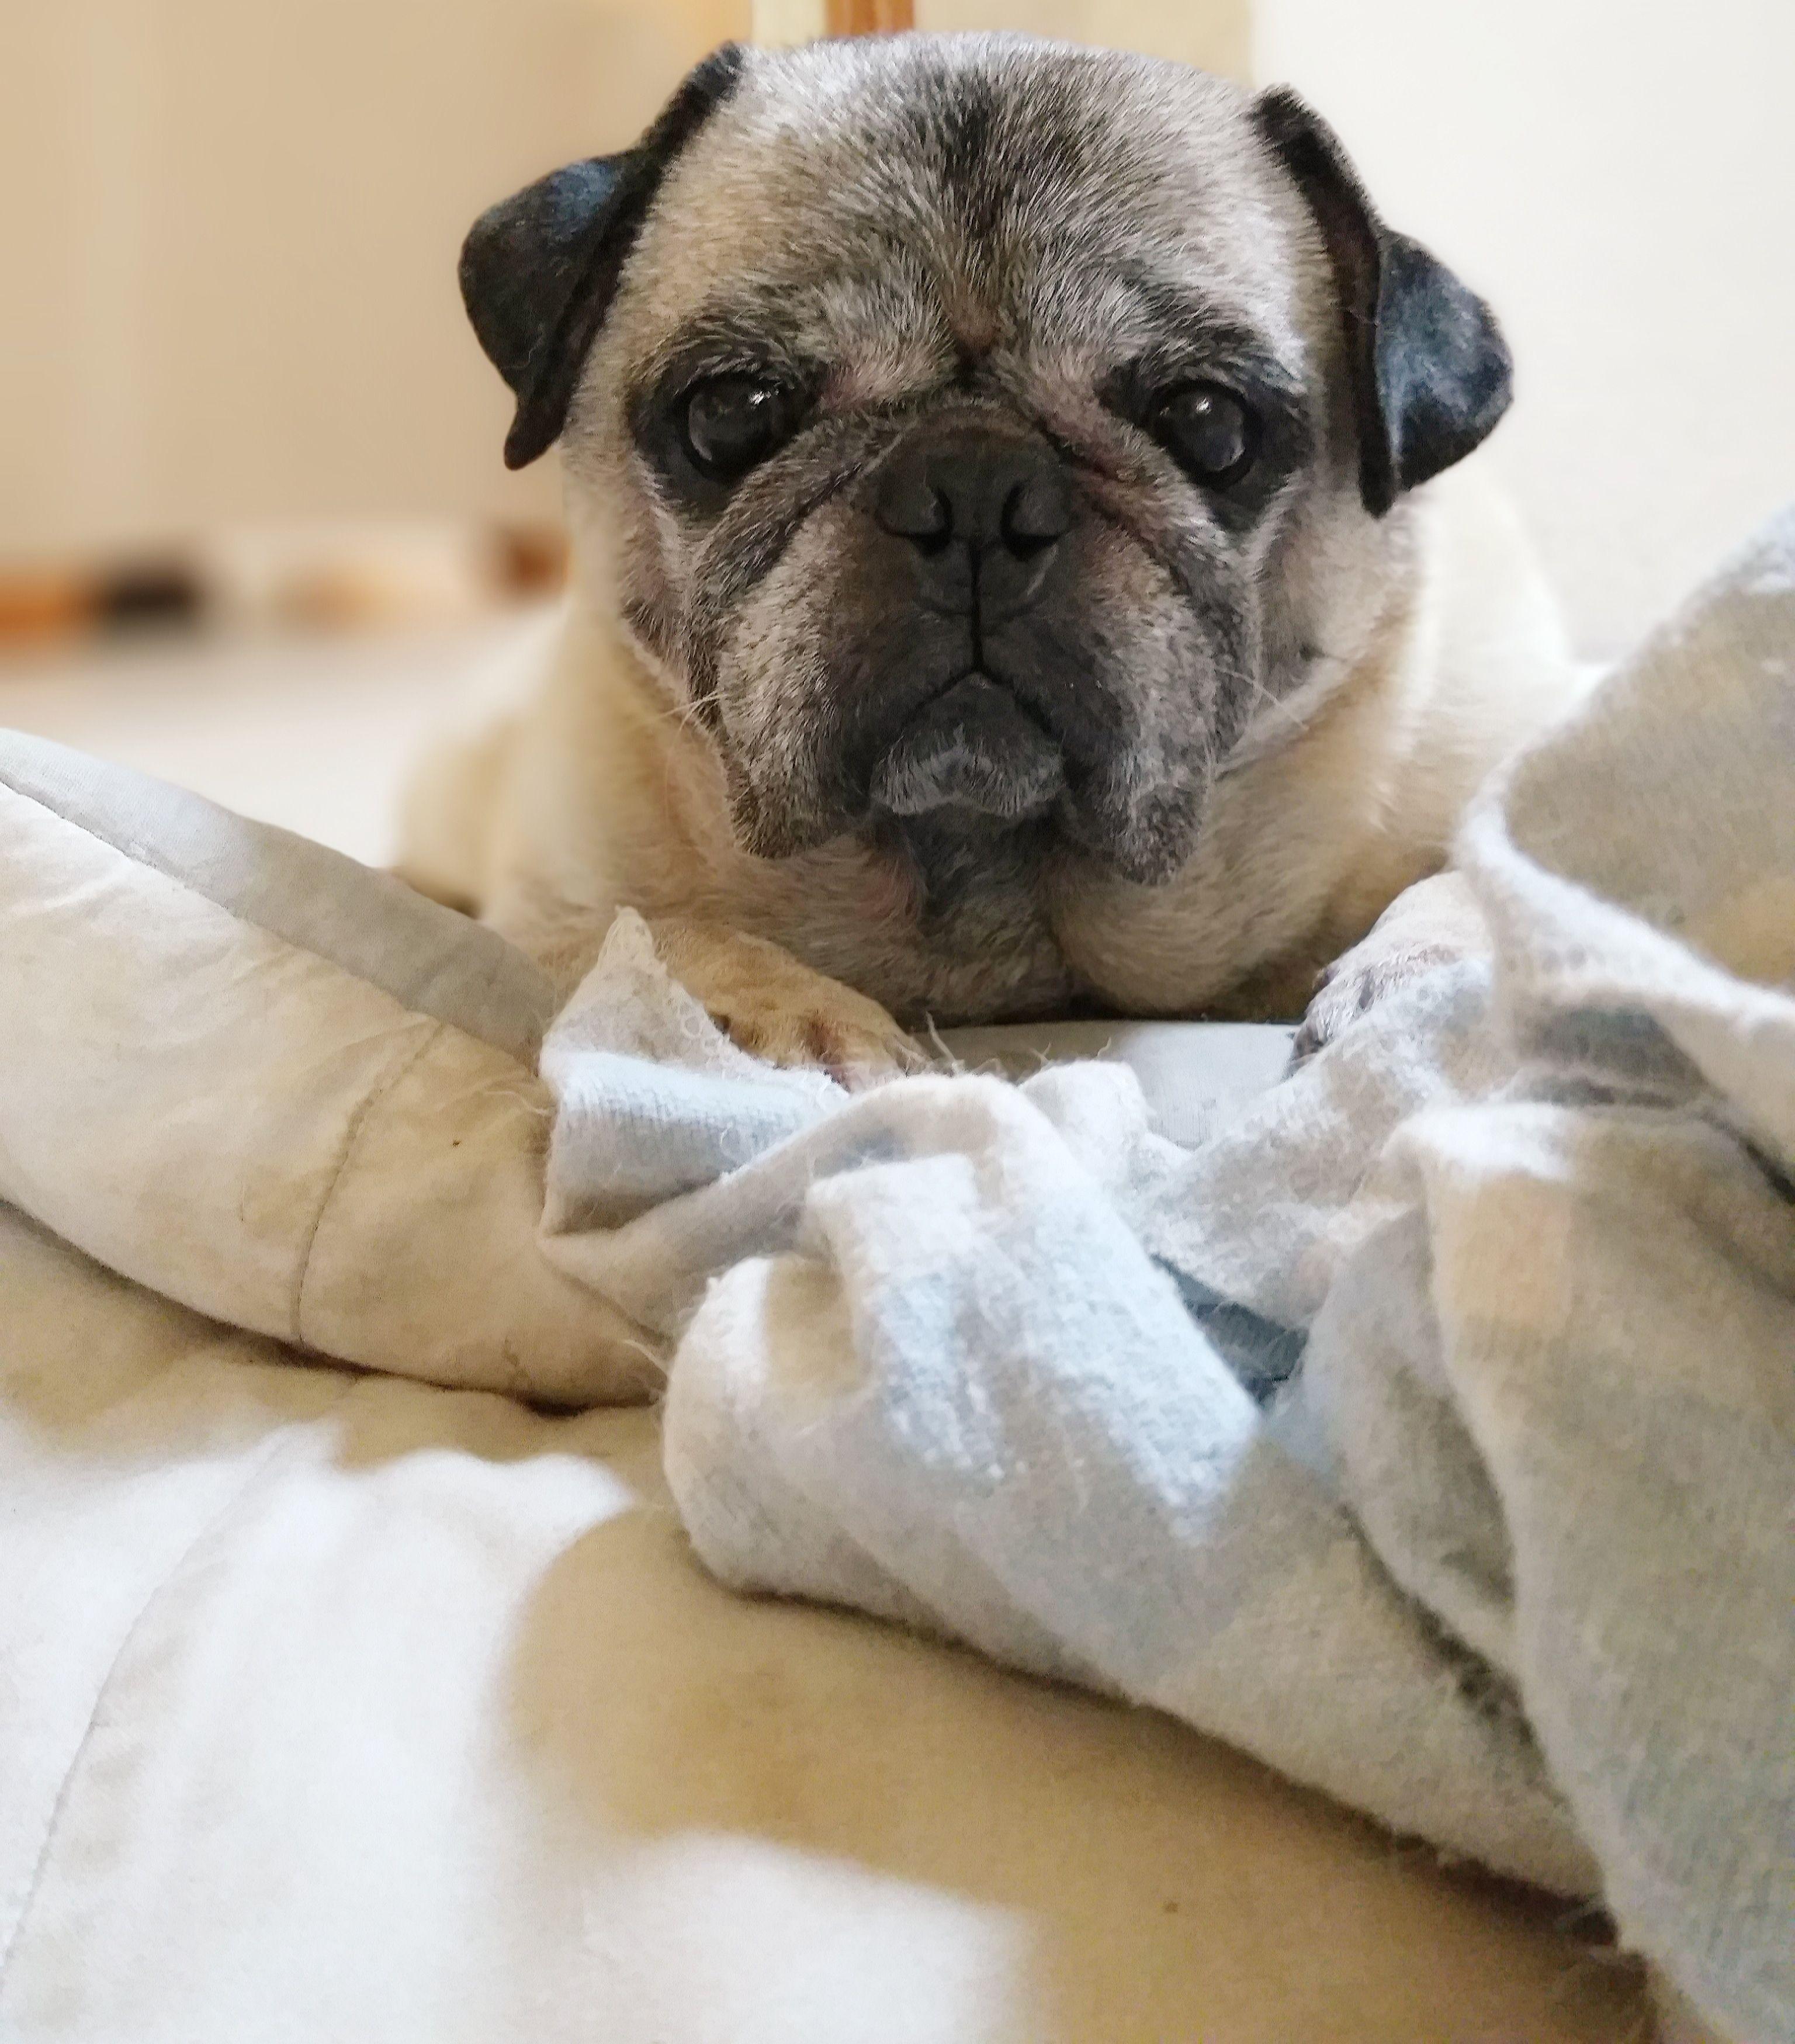 Pin By Mandy Joy On Pug Cute Dogs Cute Pugs Cute Animals